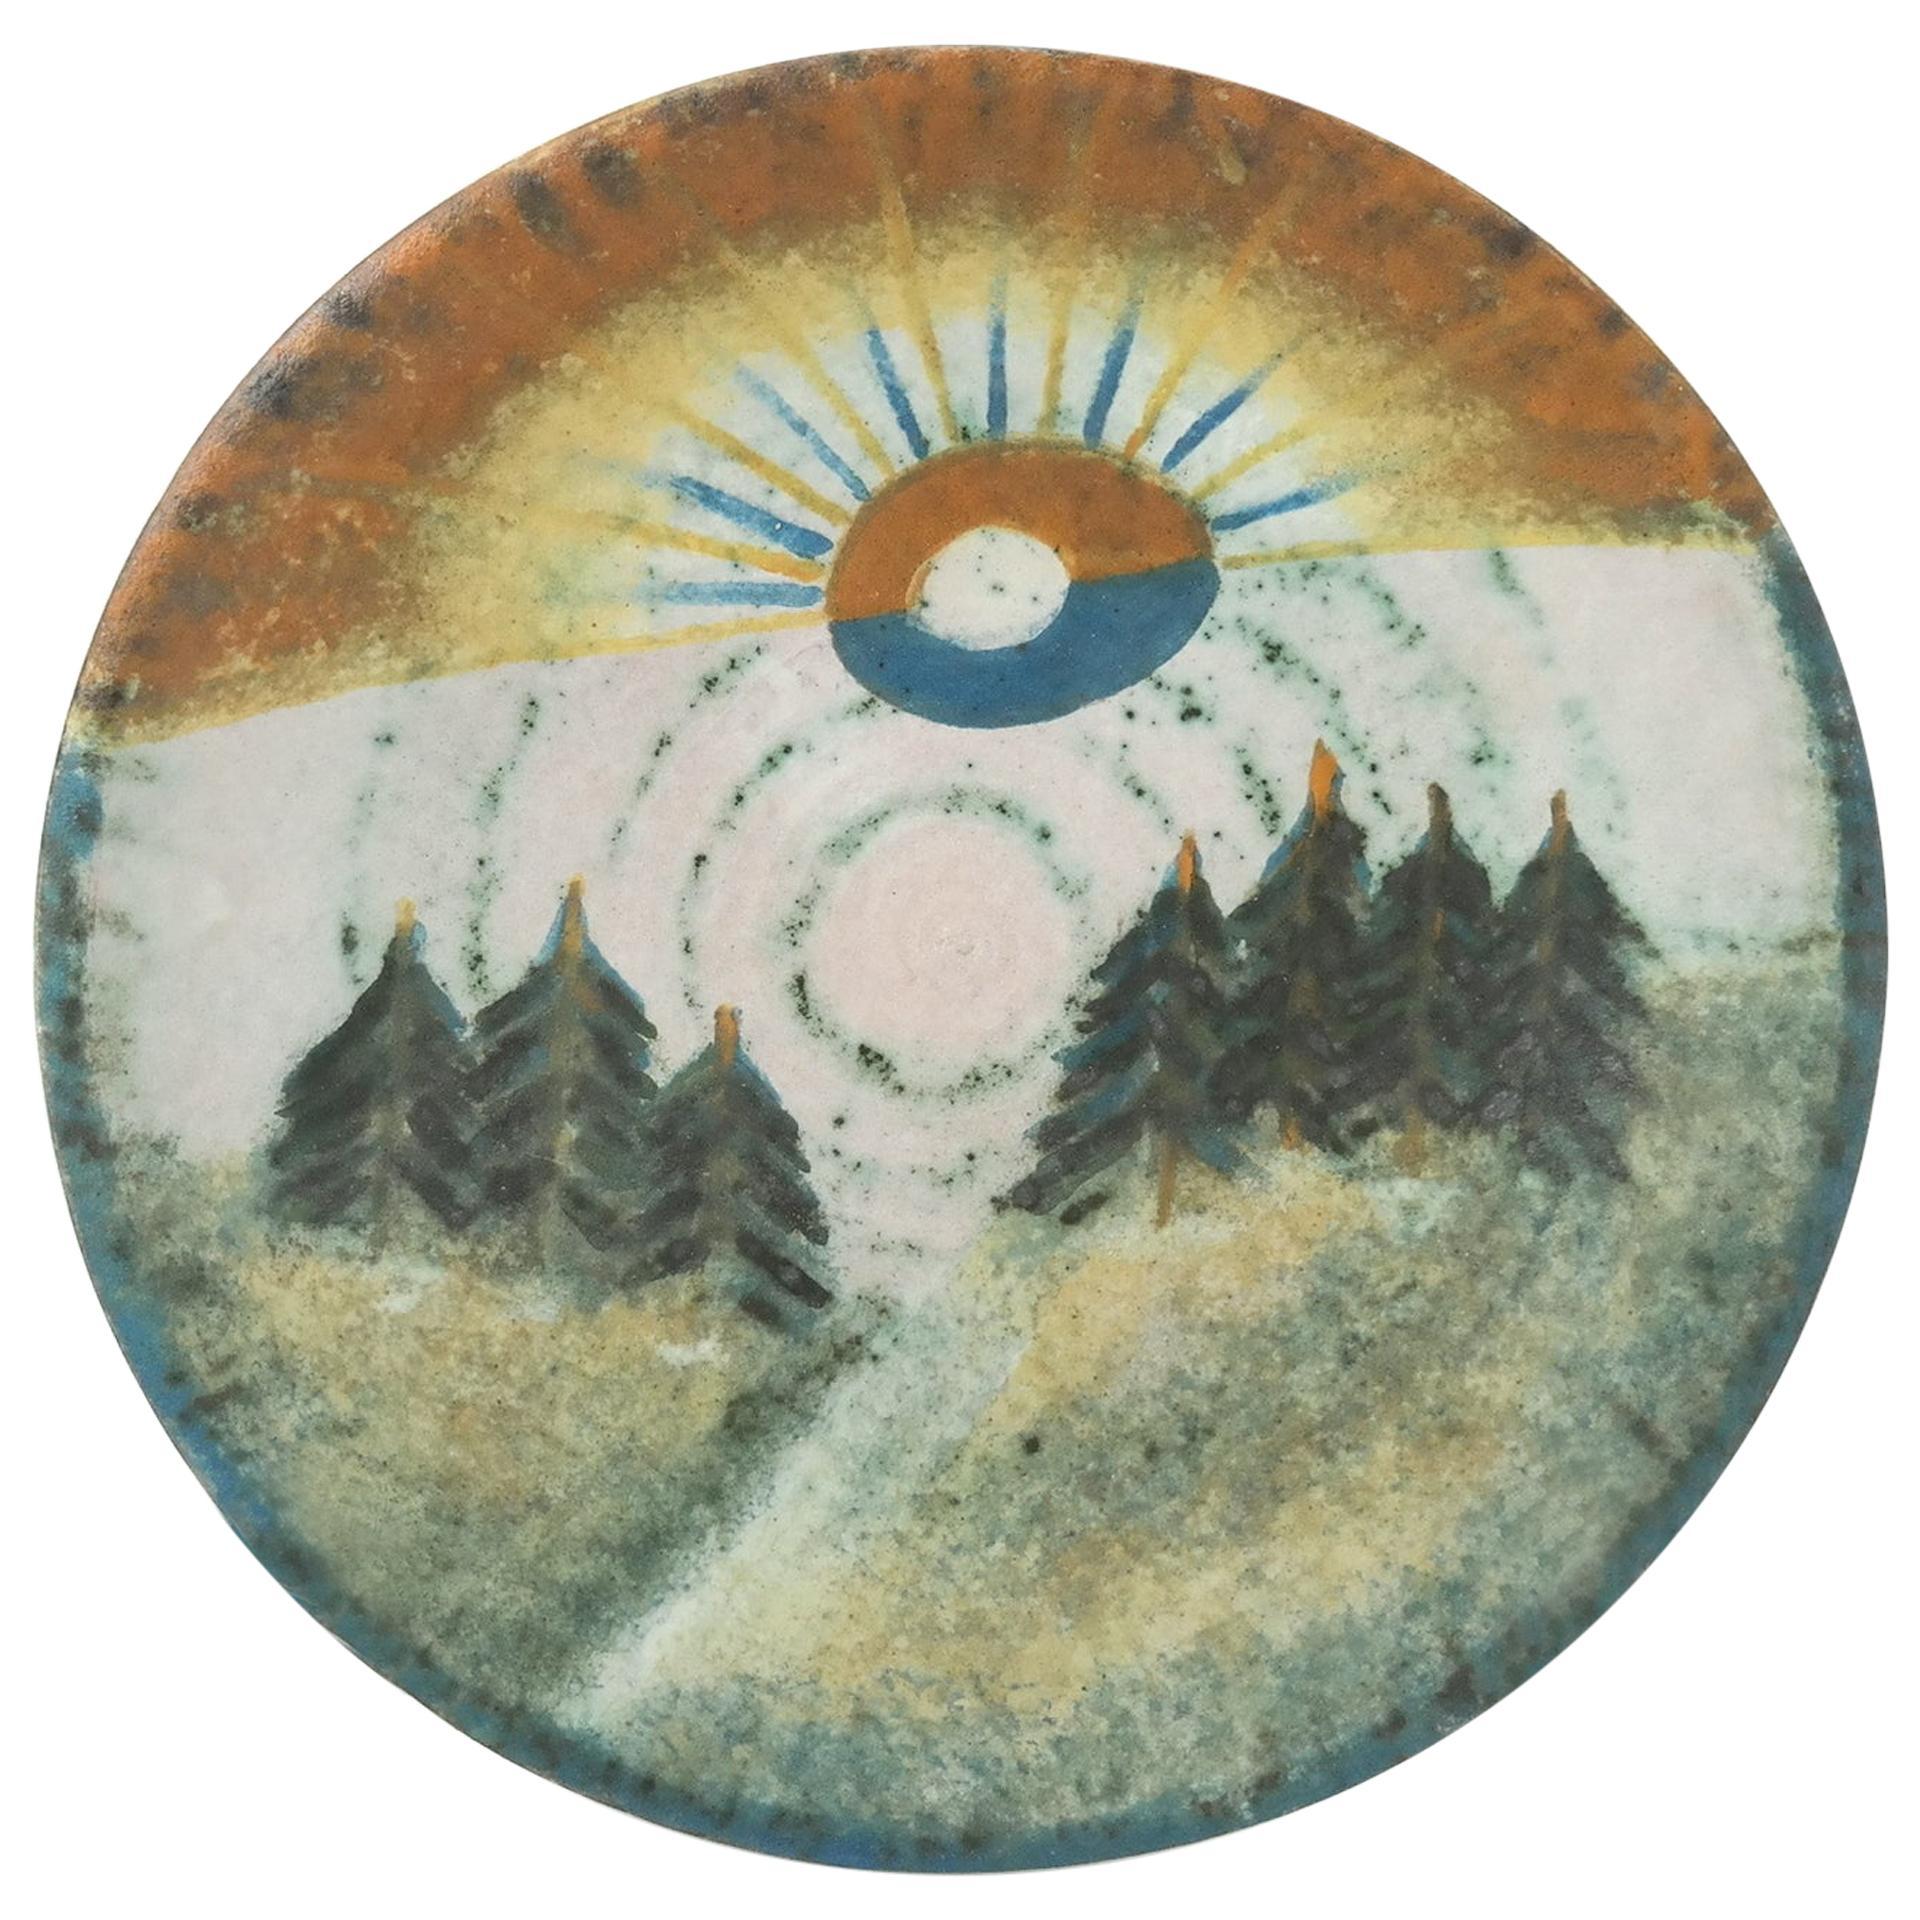 Ceramic Artwork Decorative Plate by Agoston Simo, 1970s